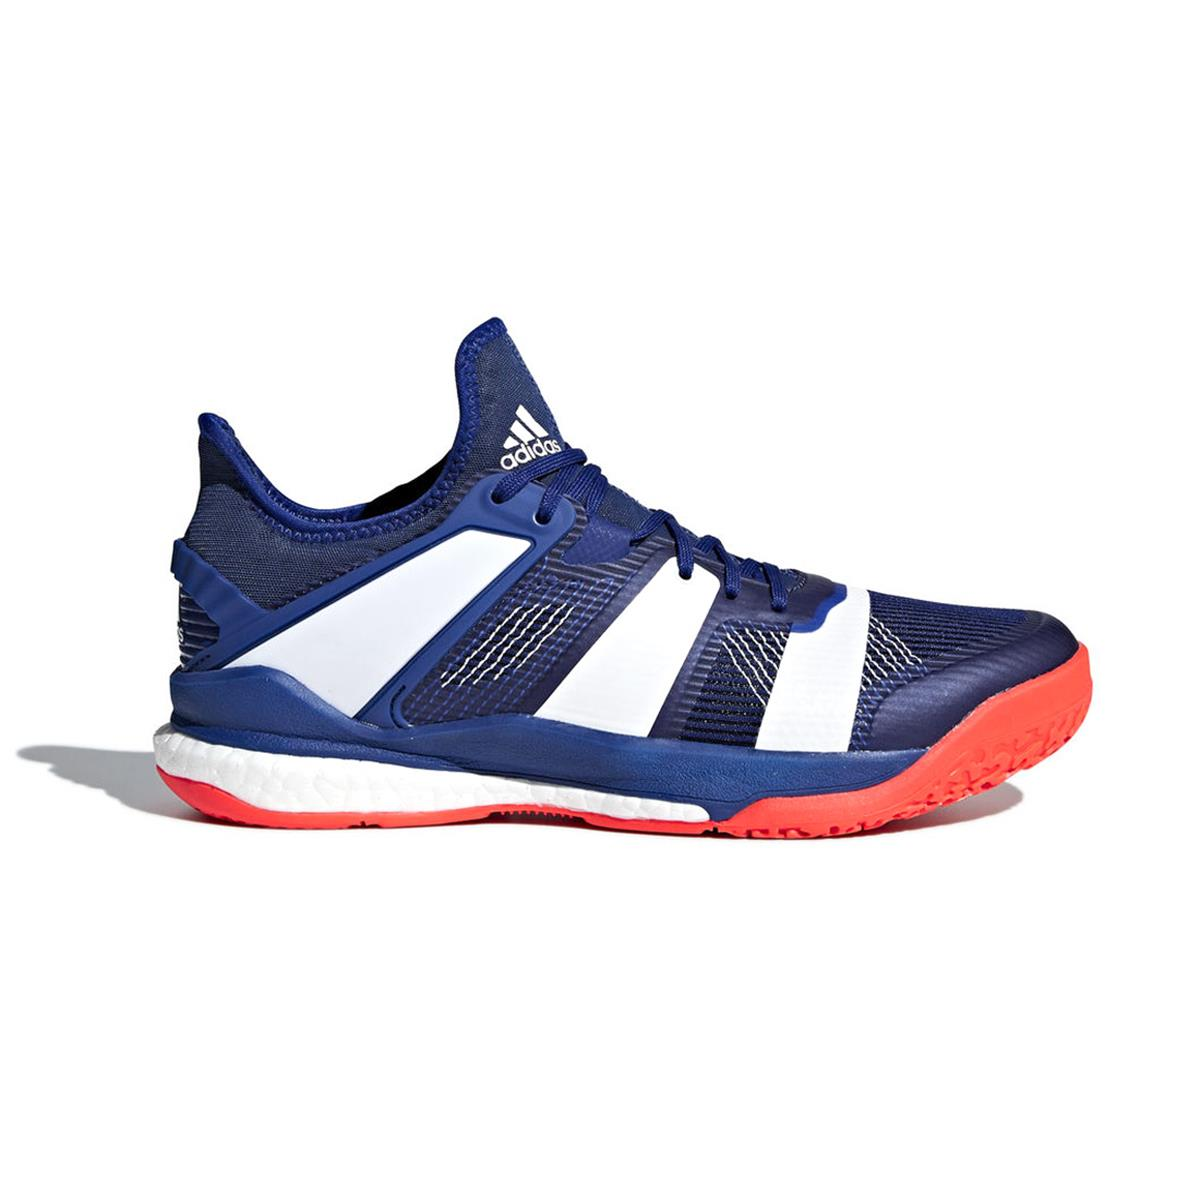 12fbec07168 adidas Stabil X Court Shoes (Blue-Orange)